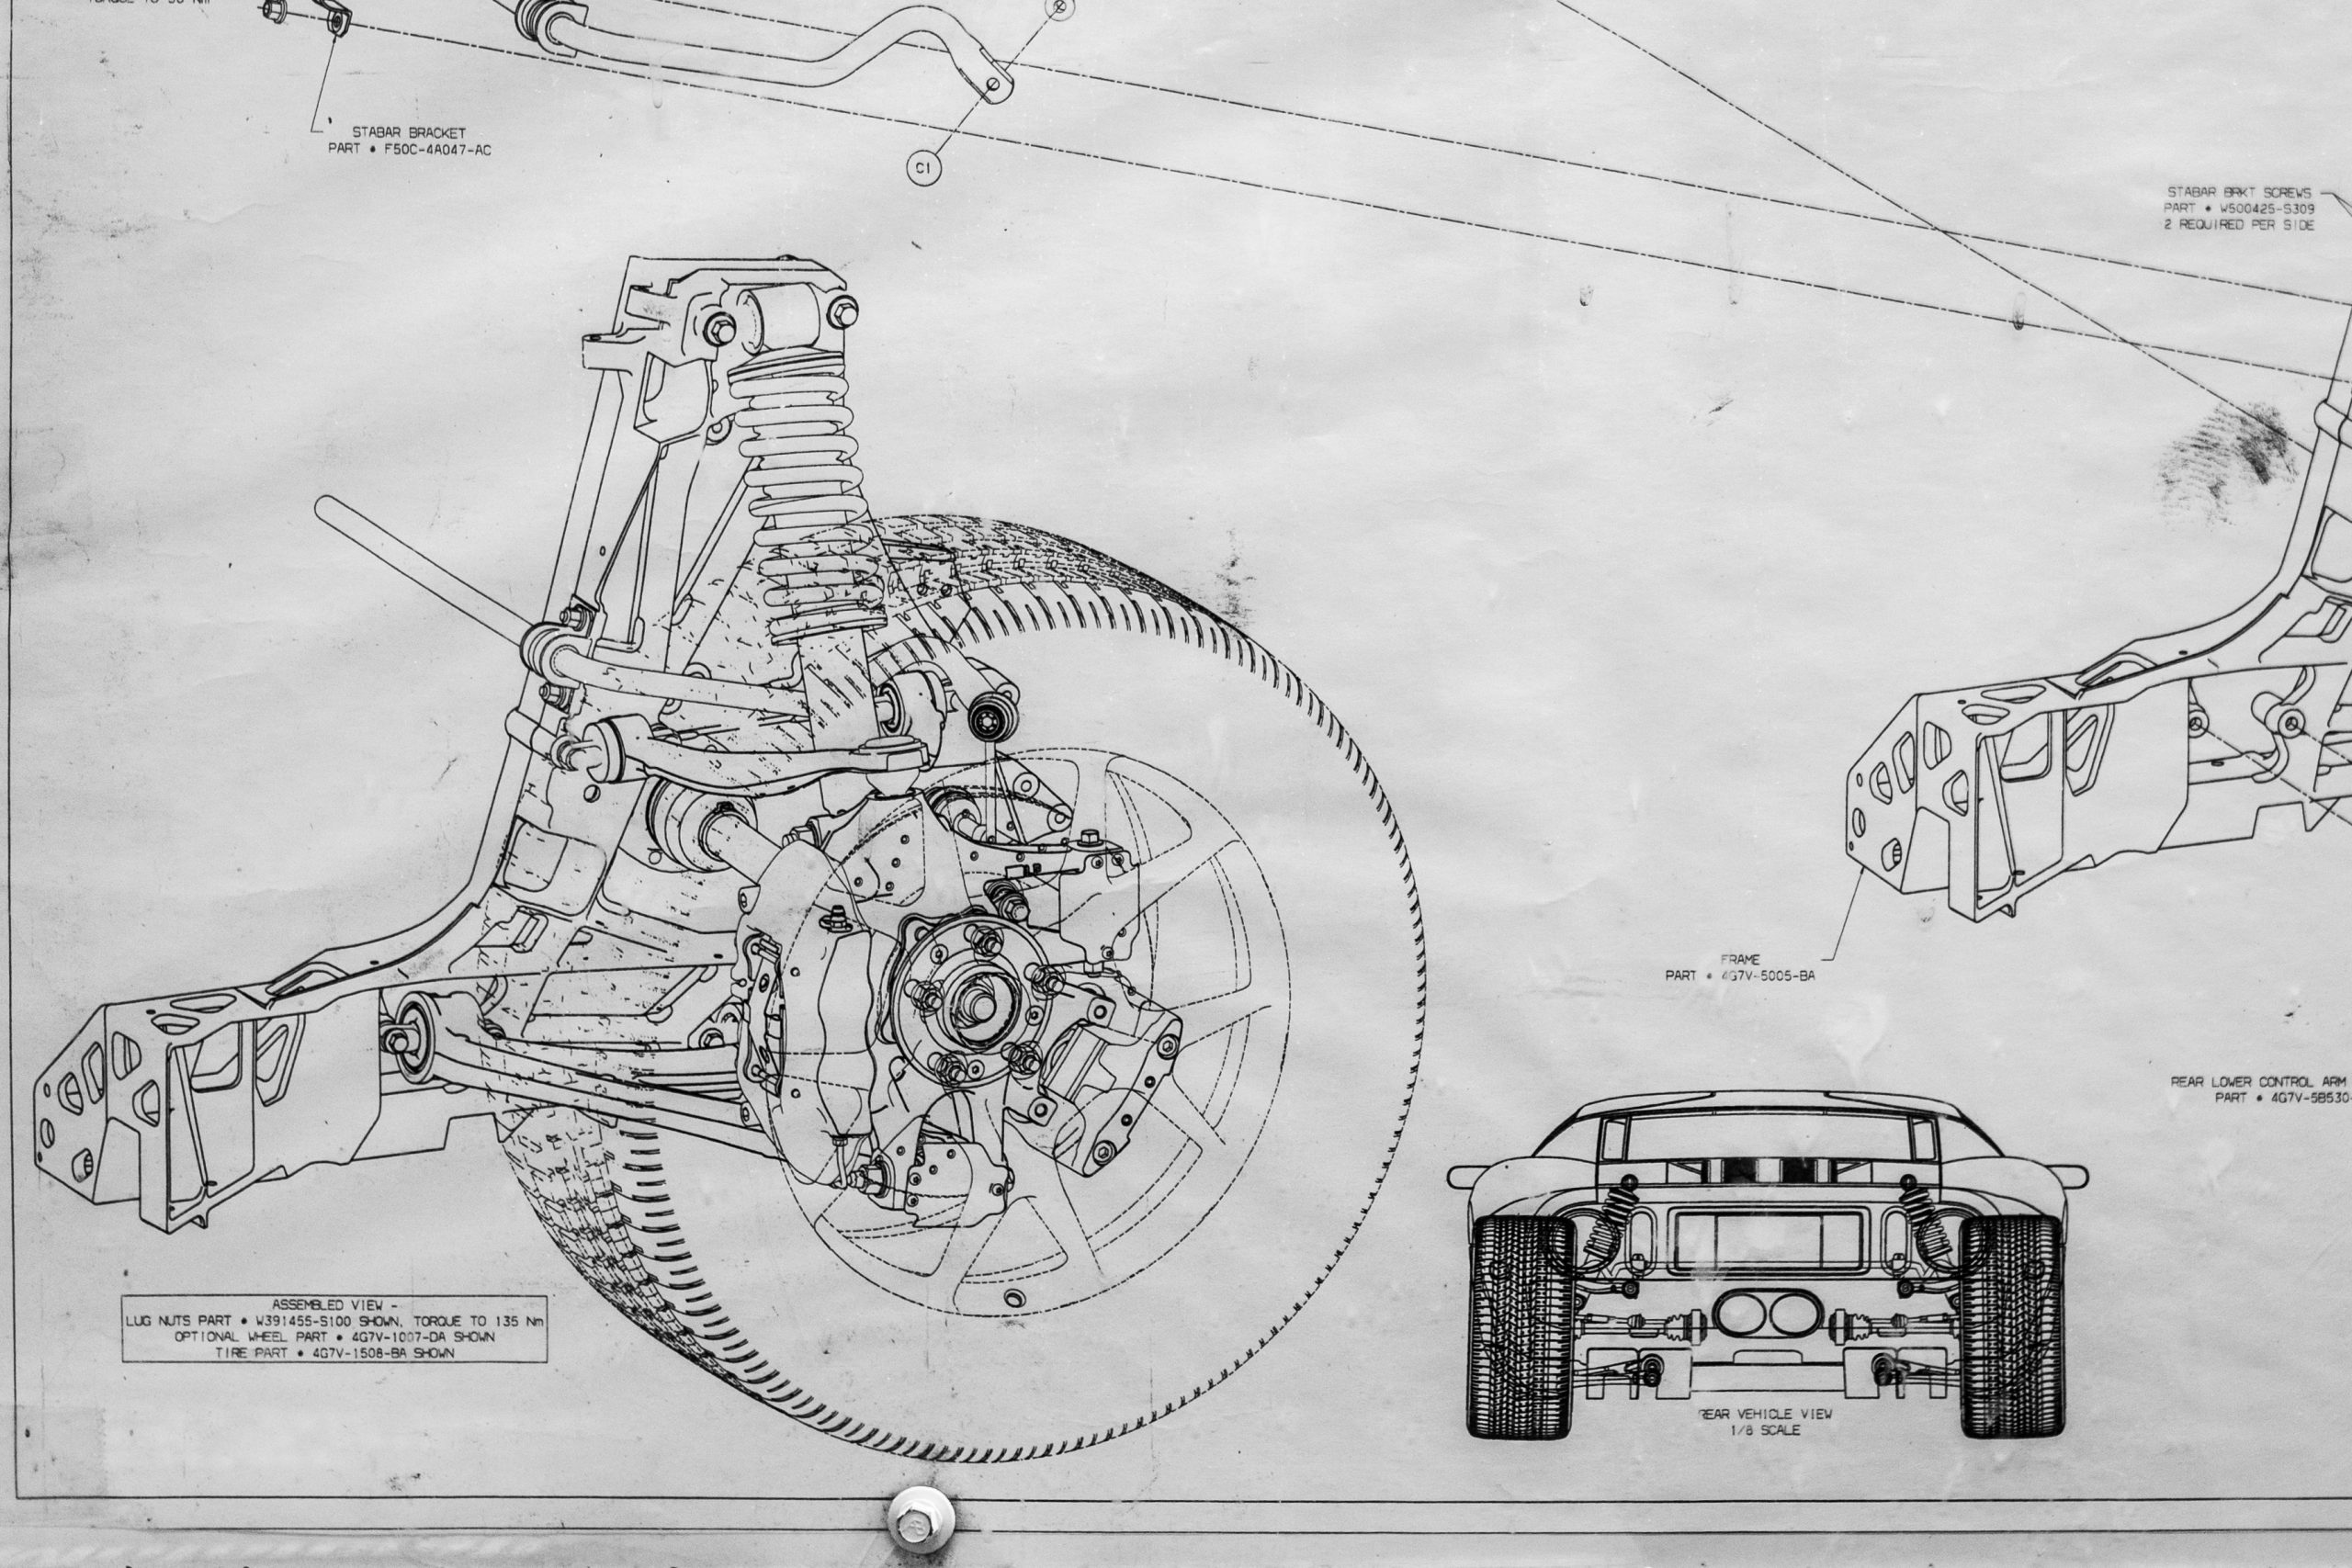 GT Resto Shop drawings